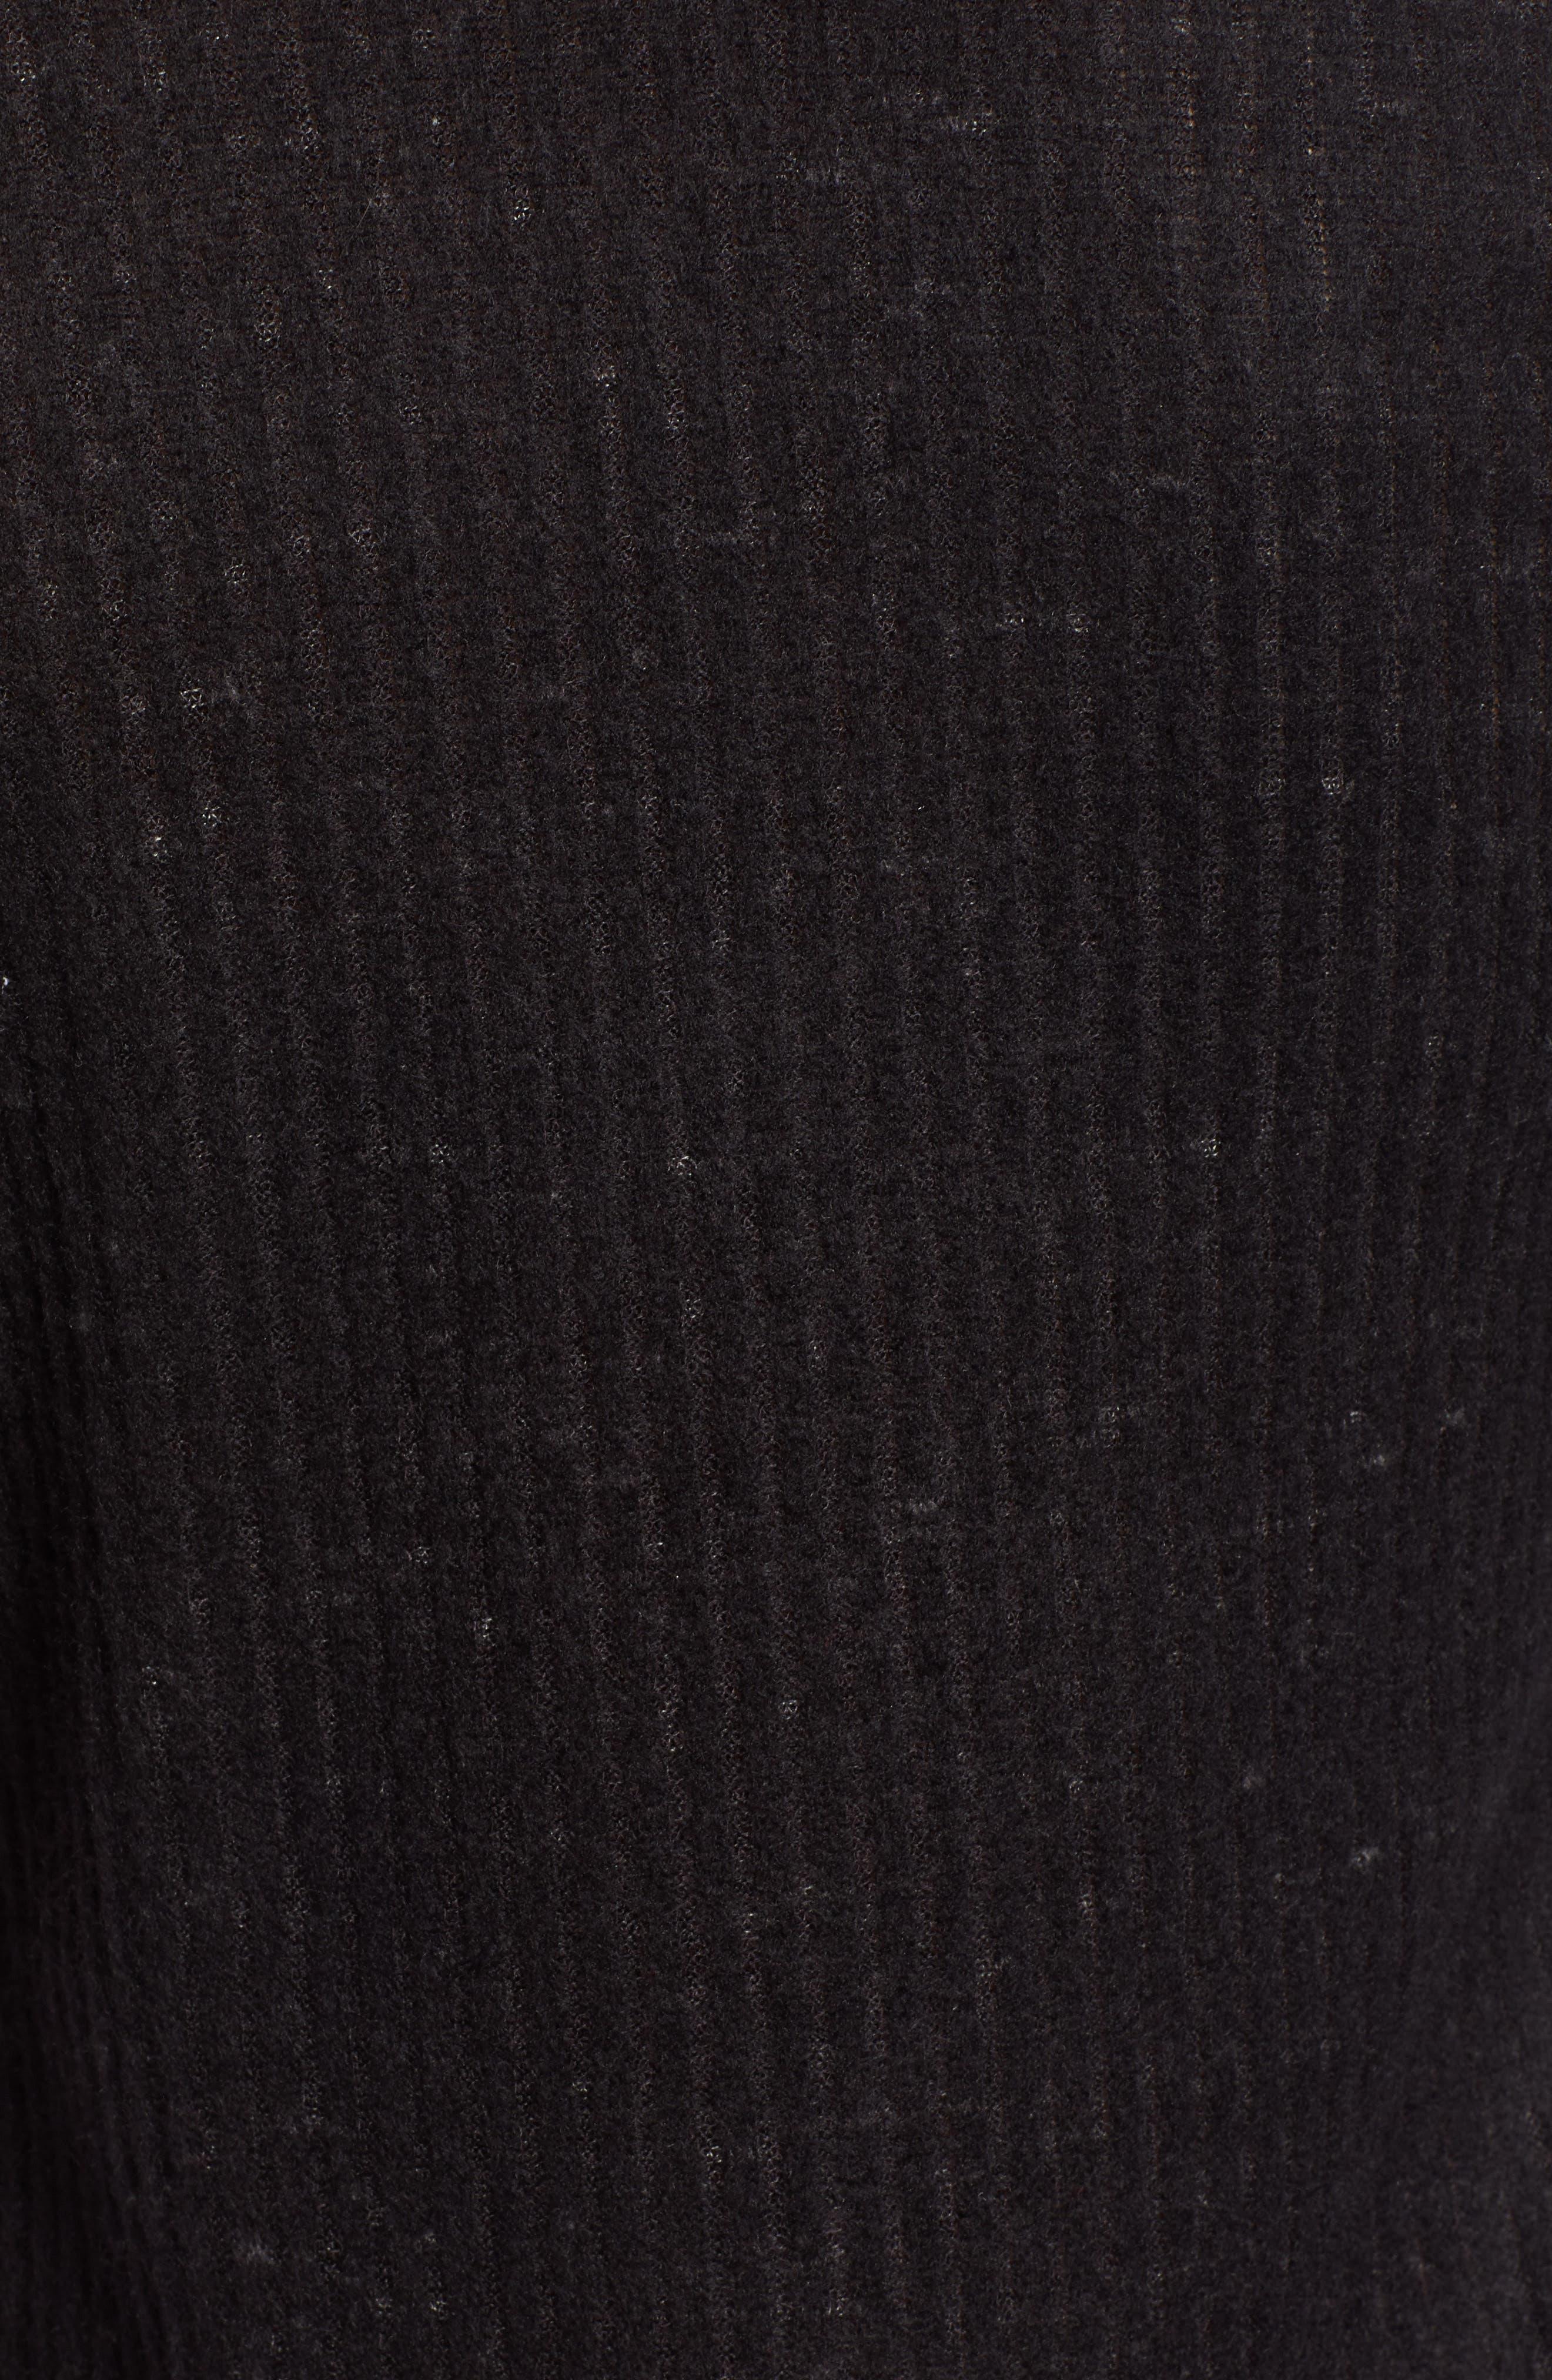 SOCIALITE,                             Sweater Dress,                             Alternate thumbnail 6, color,                             BLACK